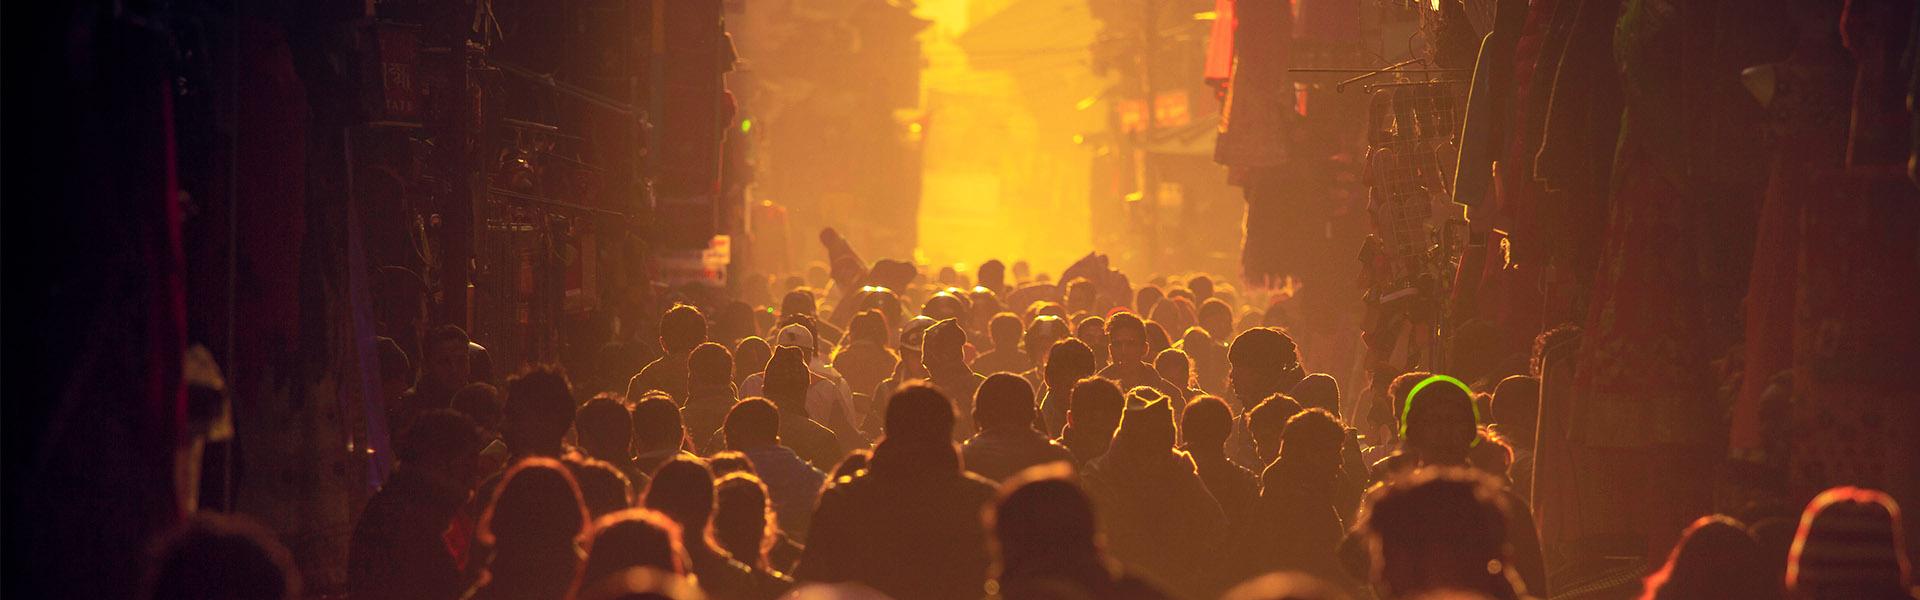 Crowded people backlit walking in street in yellow glow